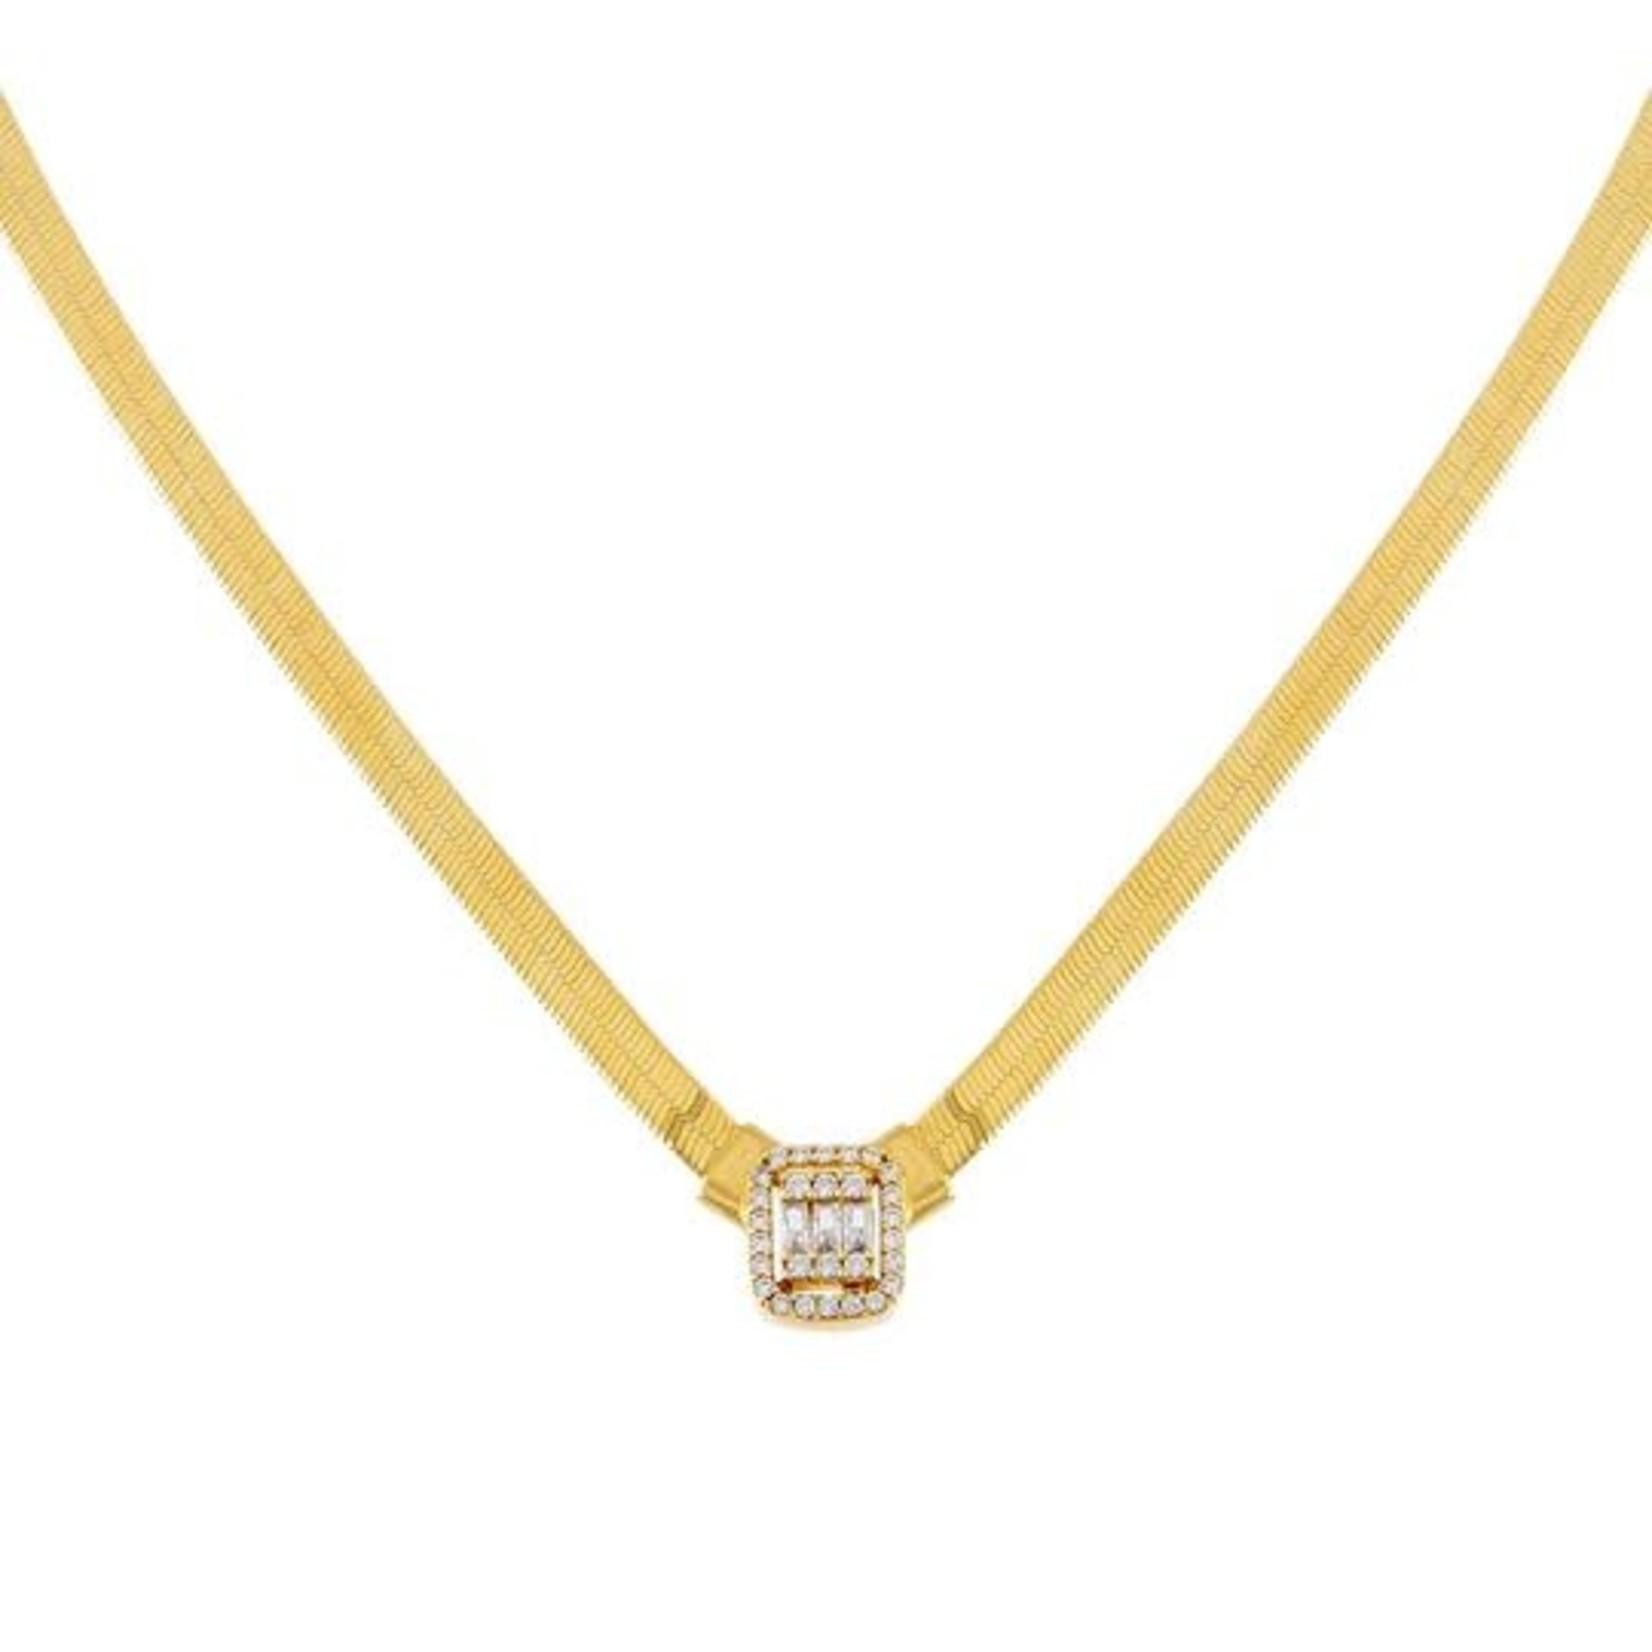 Adinas CZ Illusion Baguette Herringbone Necklace 14K